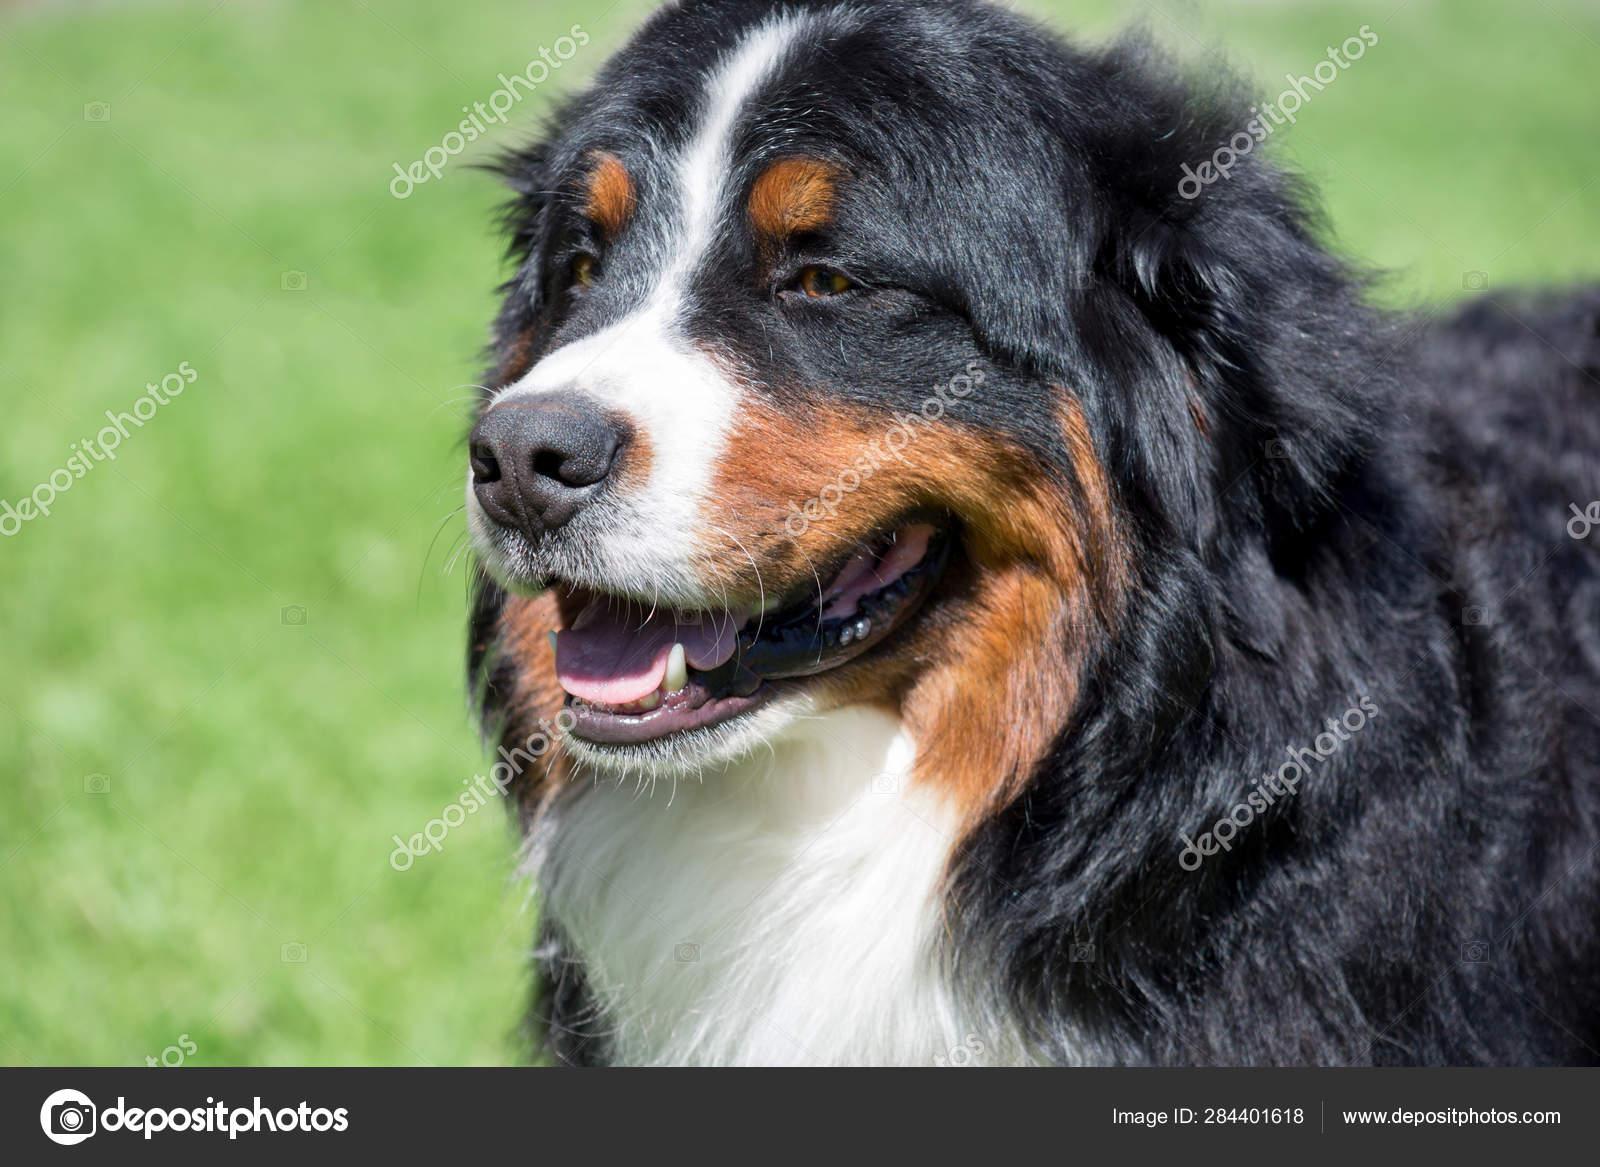 Cute Bernese Mountain Dog Puppy Is Standing On A Green Meadow Berner Sennenhund Or Bernese Cattle Dog Stock Photo C Sergeytikhomirov 284401618